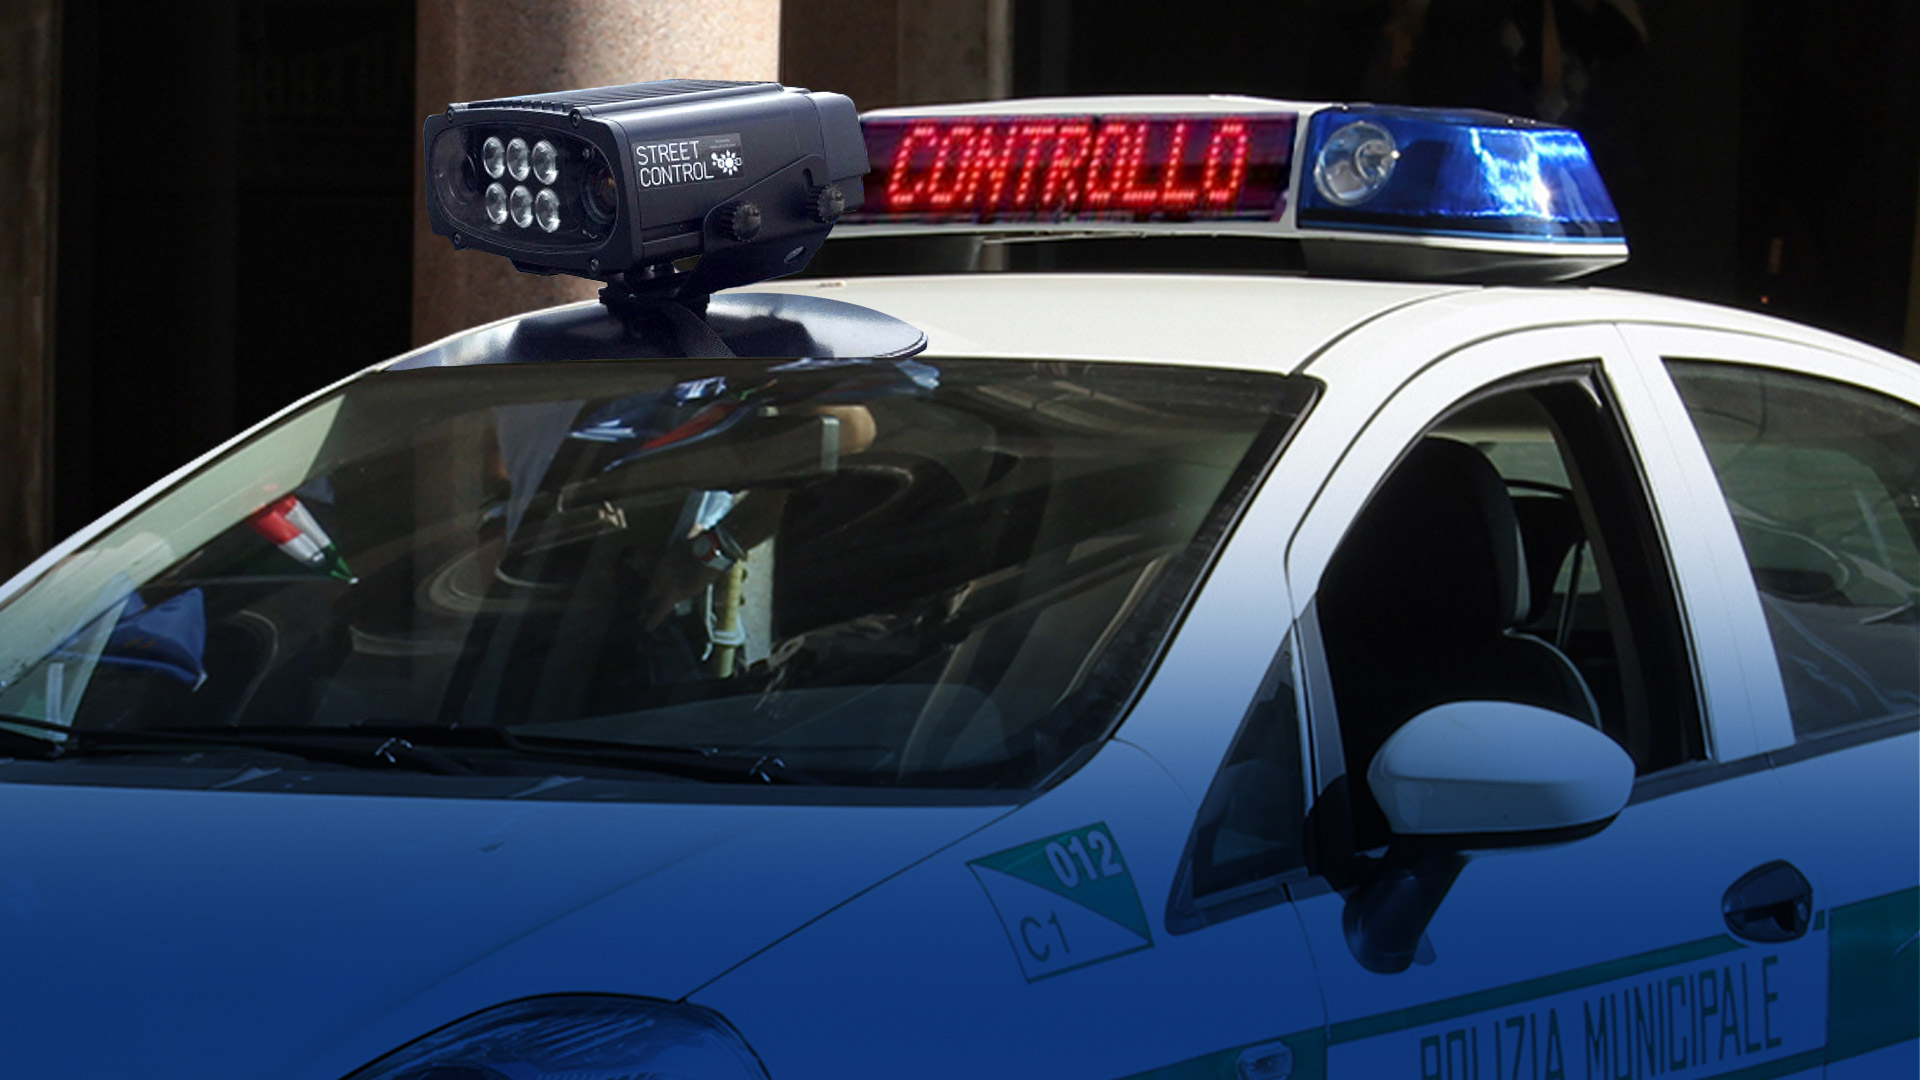 StreetControl